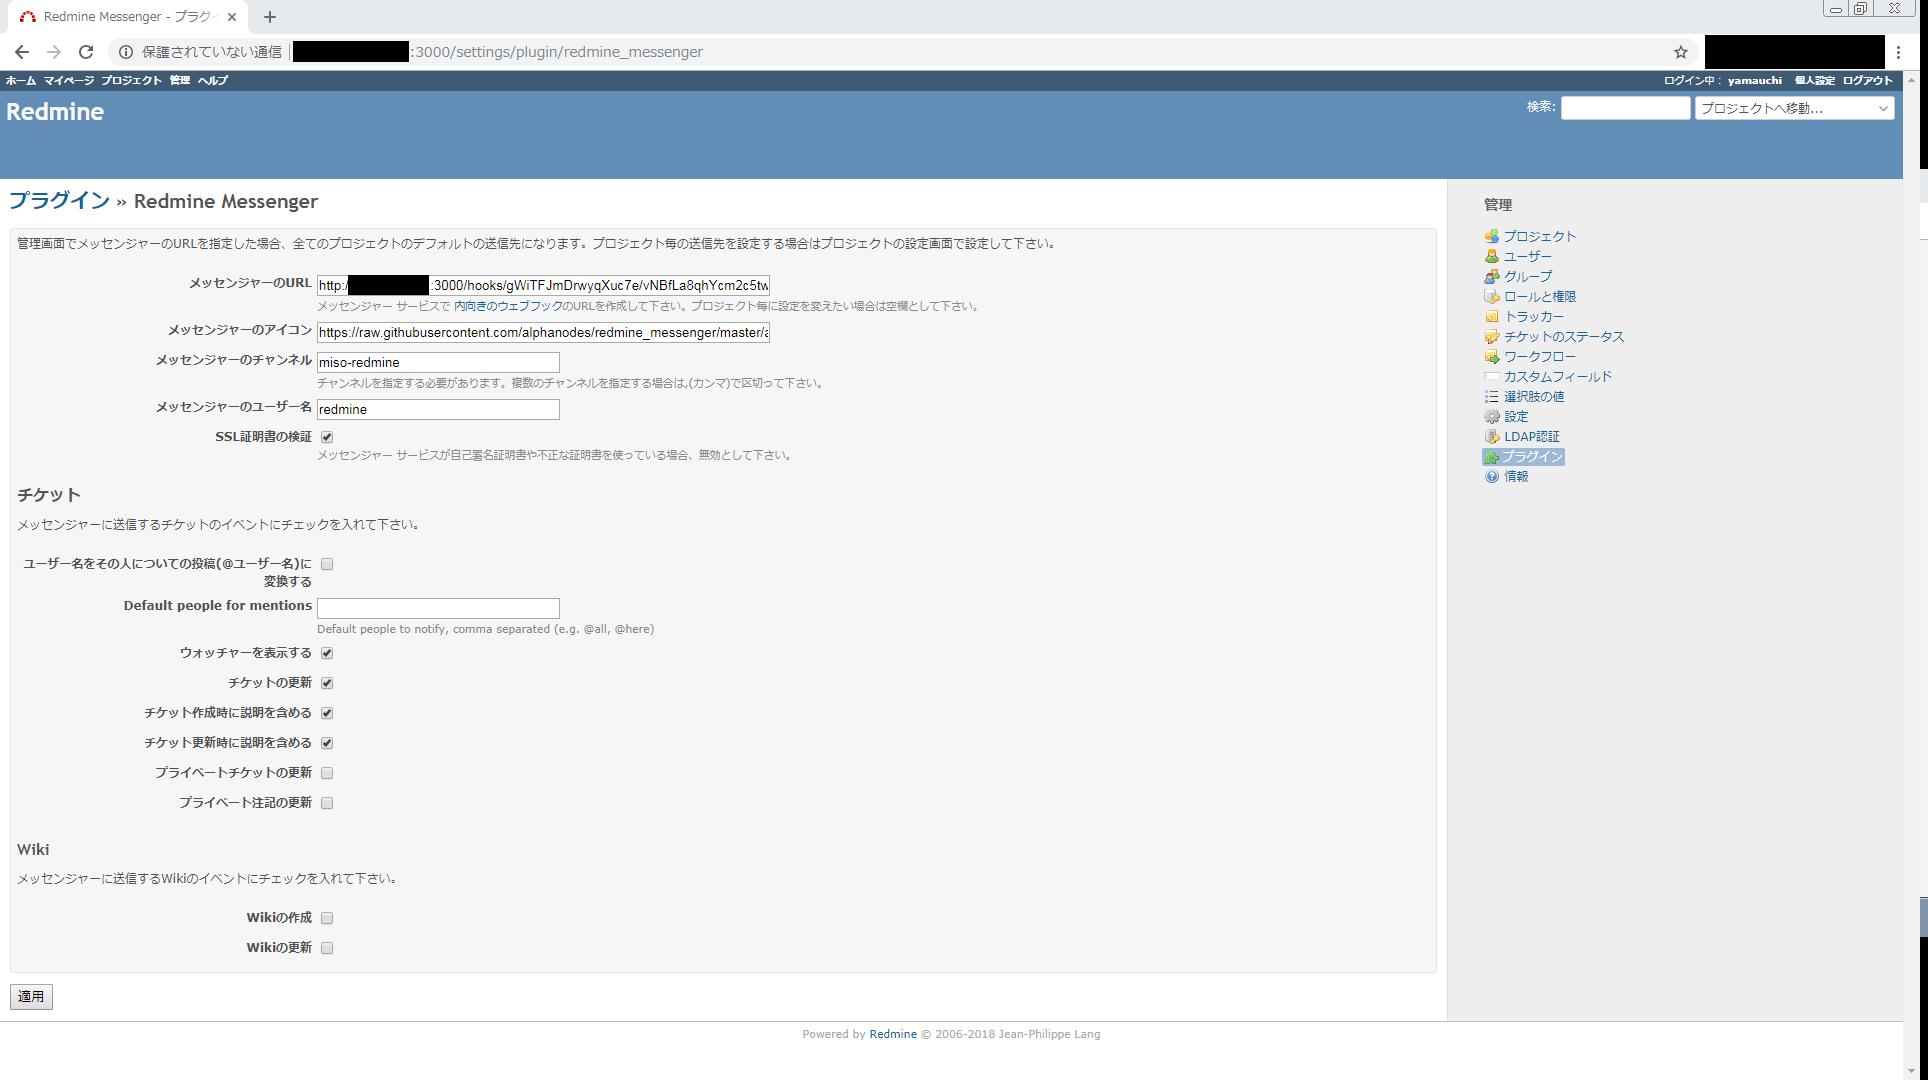 Dockerで構築したRedmineとRocket Chatを連携させてDevOpsっぽさ